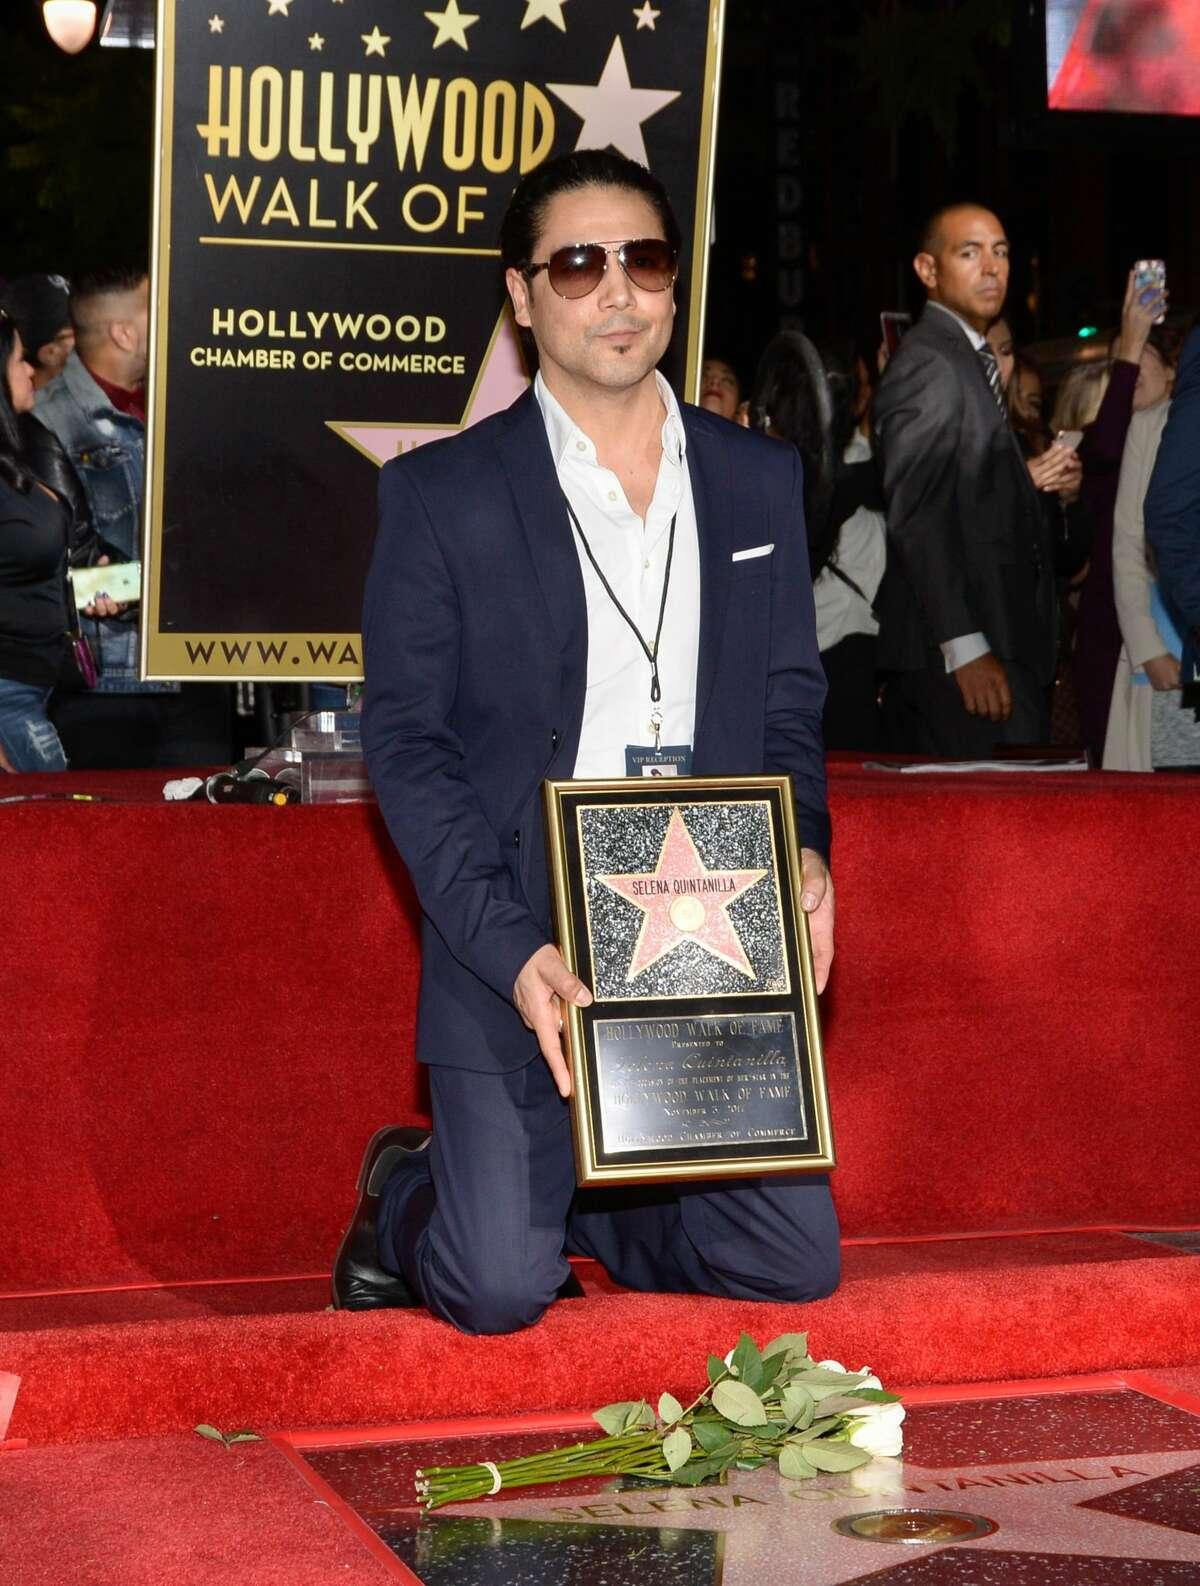 Musician Chris Perez and widower of Tejano star Selena graduated from Thomas Jefferson High School.